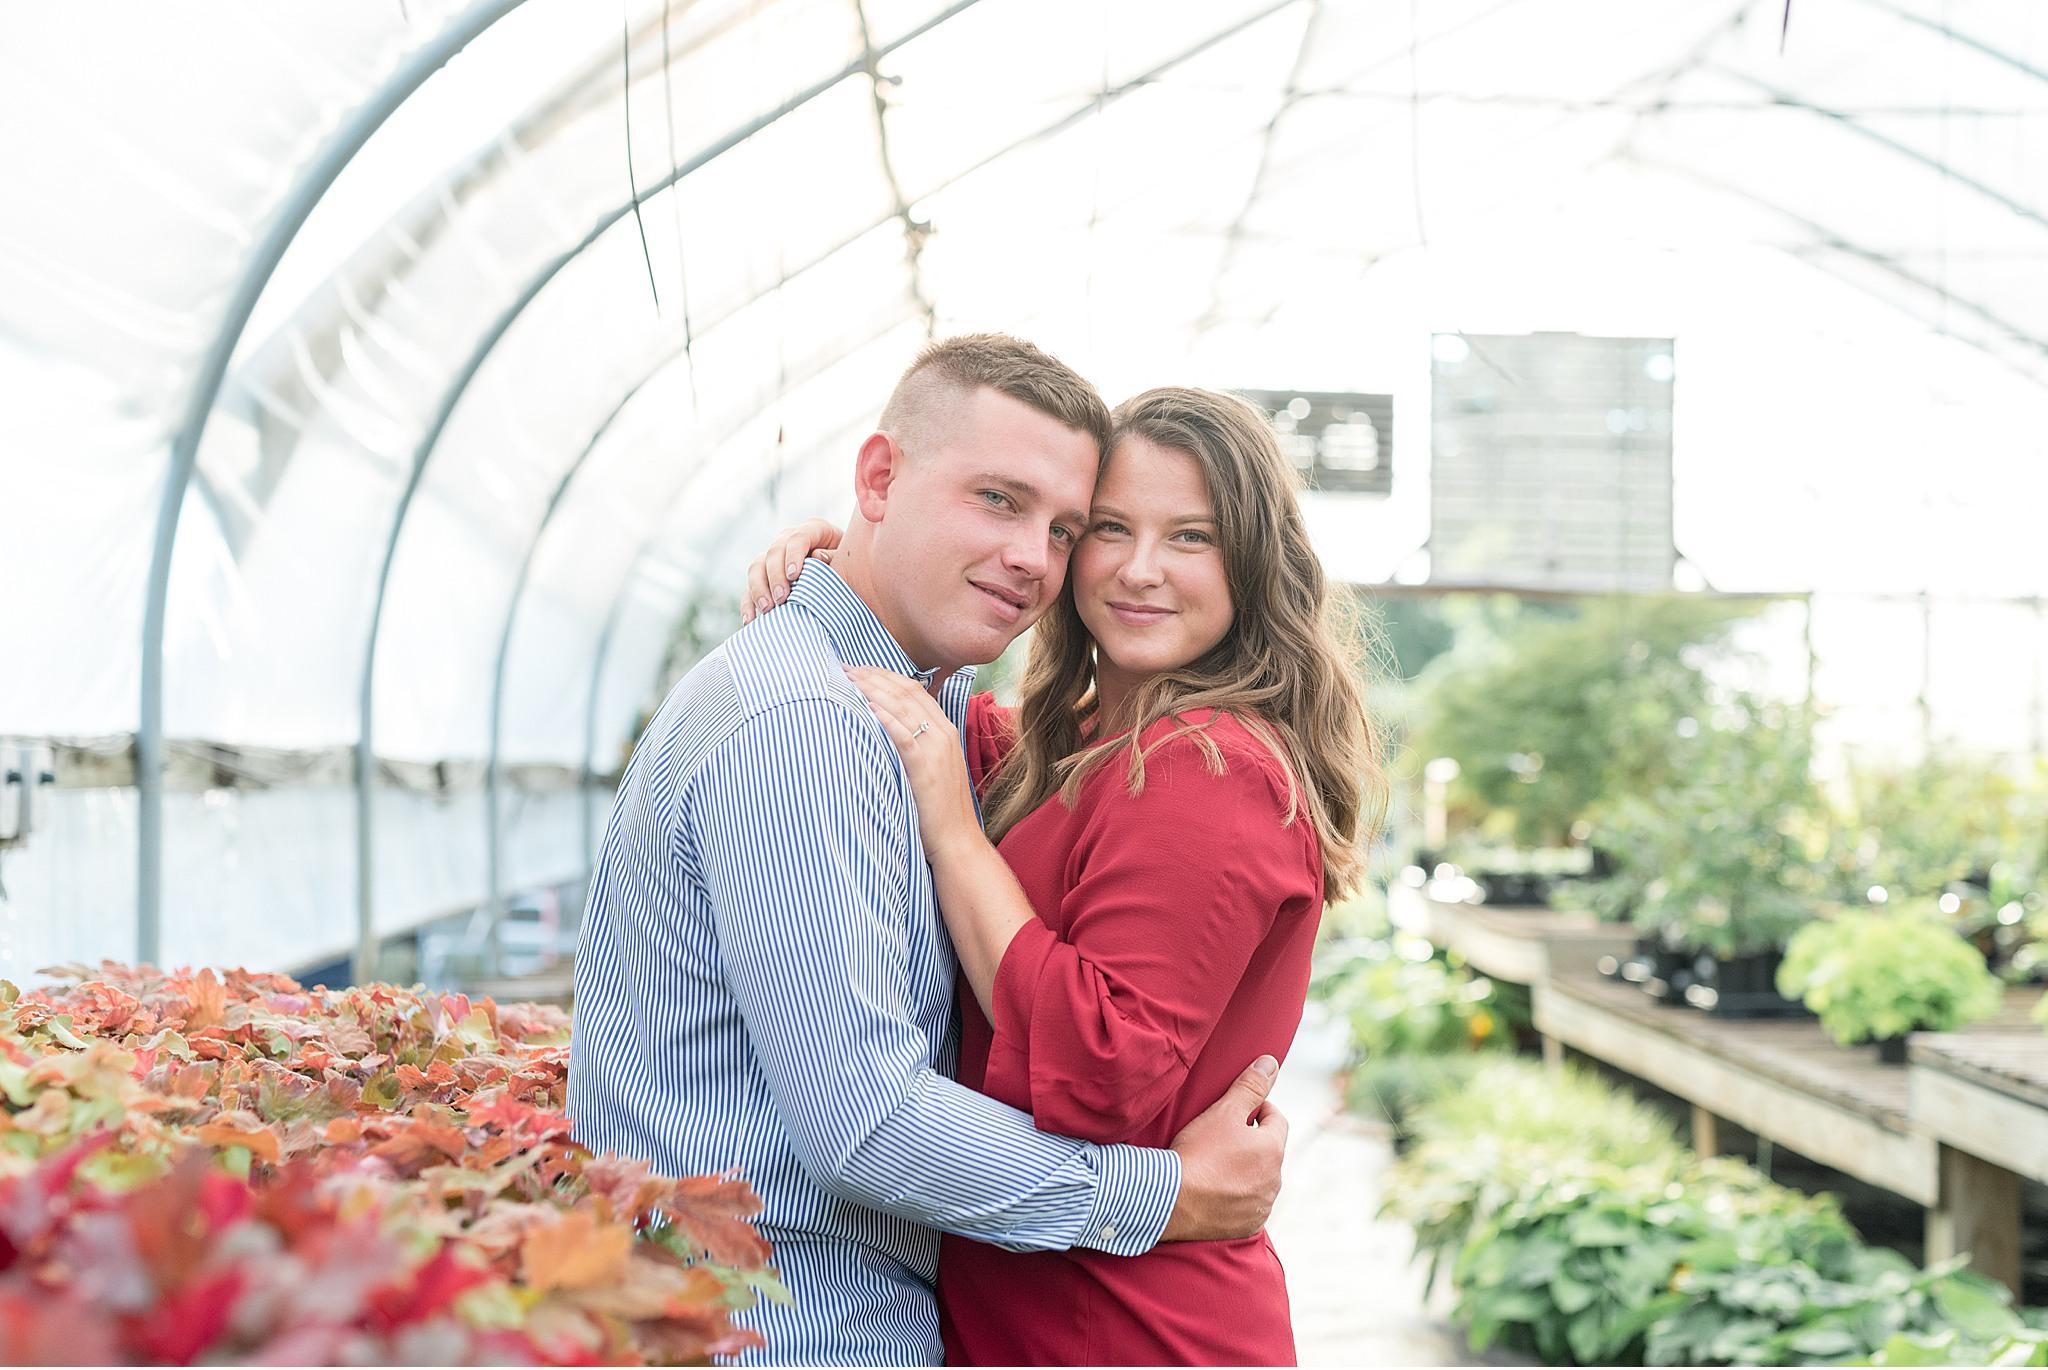 Tudbinks Greenhouse Lancaster PA wedding engagement photography_3962.jpg